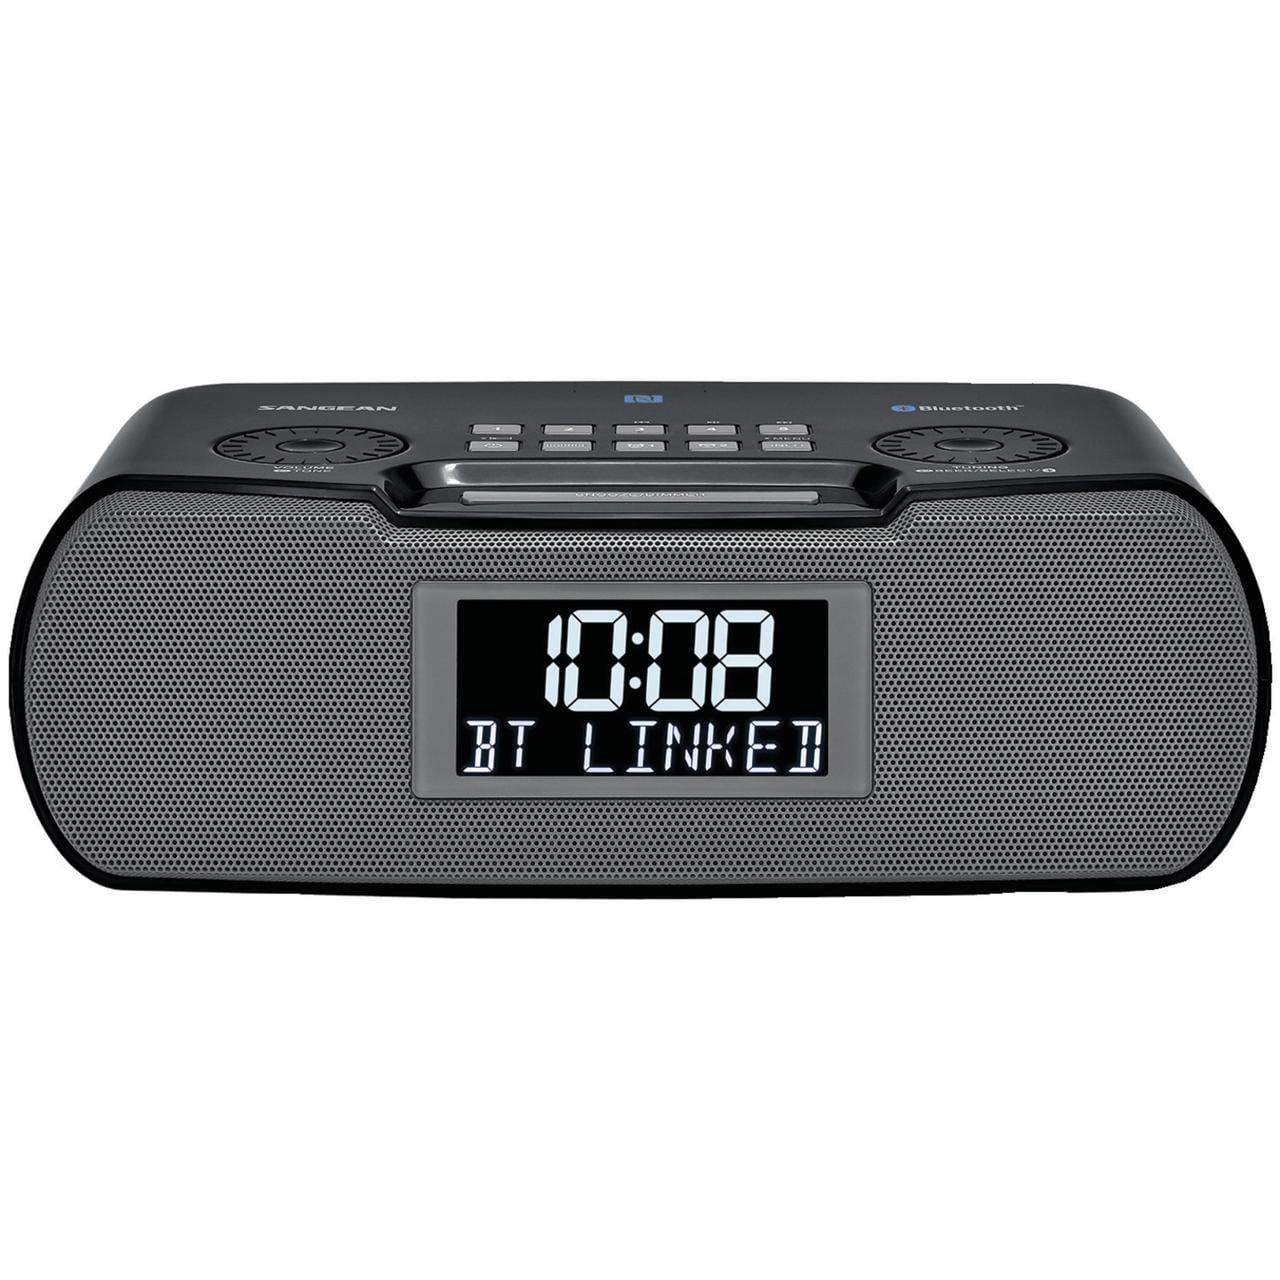 Sangean RCR-20 Digital AM FM-RDS Bluetooth Clock Radio with USB Charger by Sangean